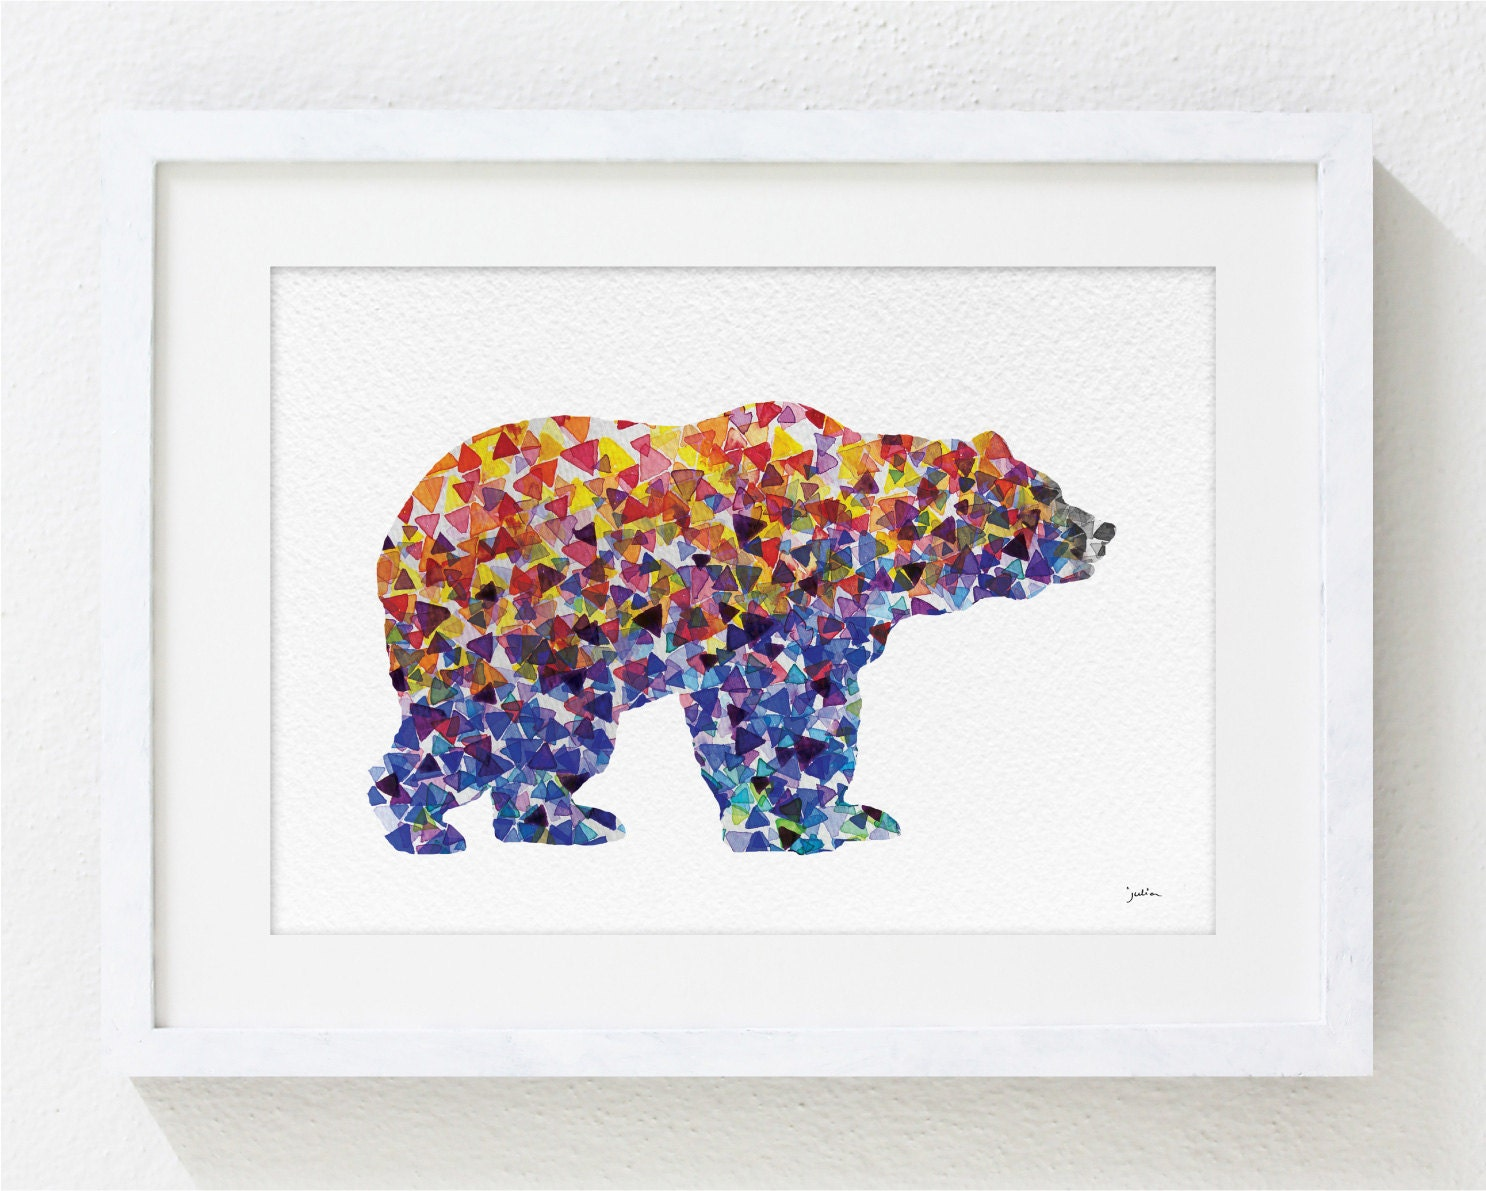 blue bear art watercolor painting 5x7 archival print